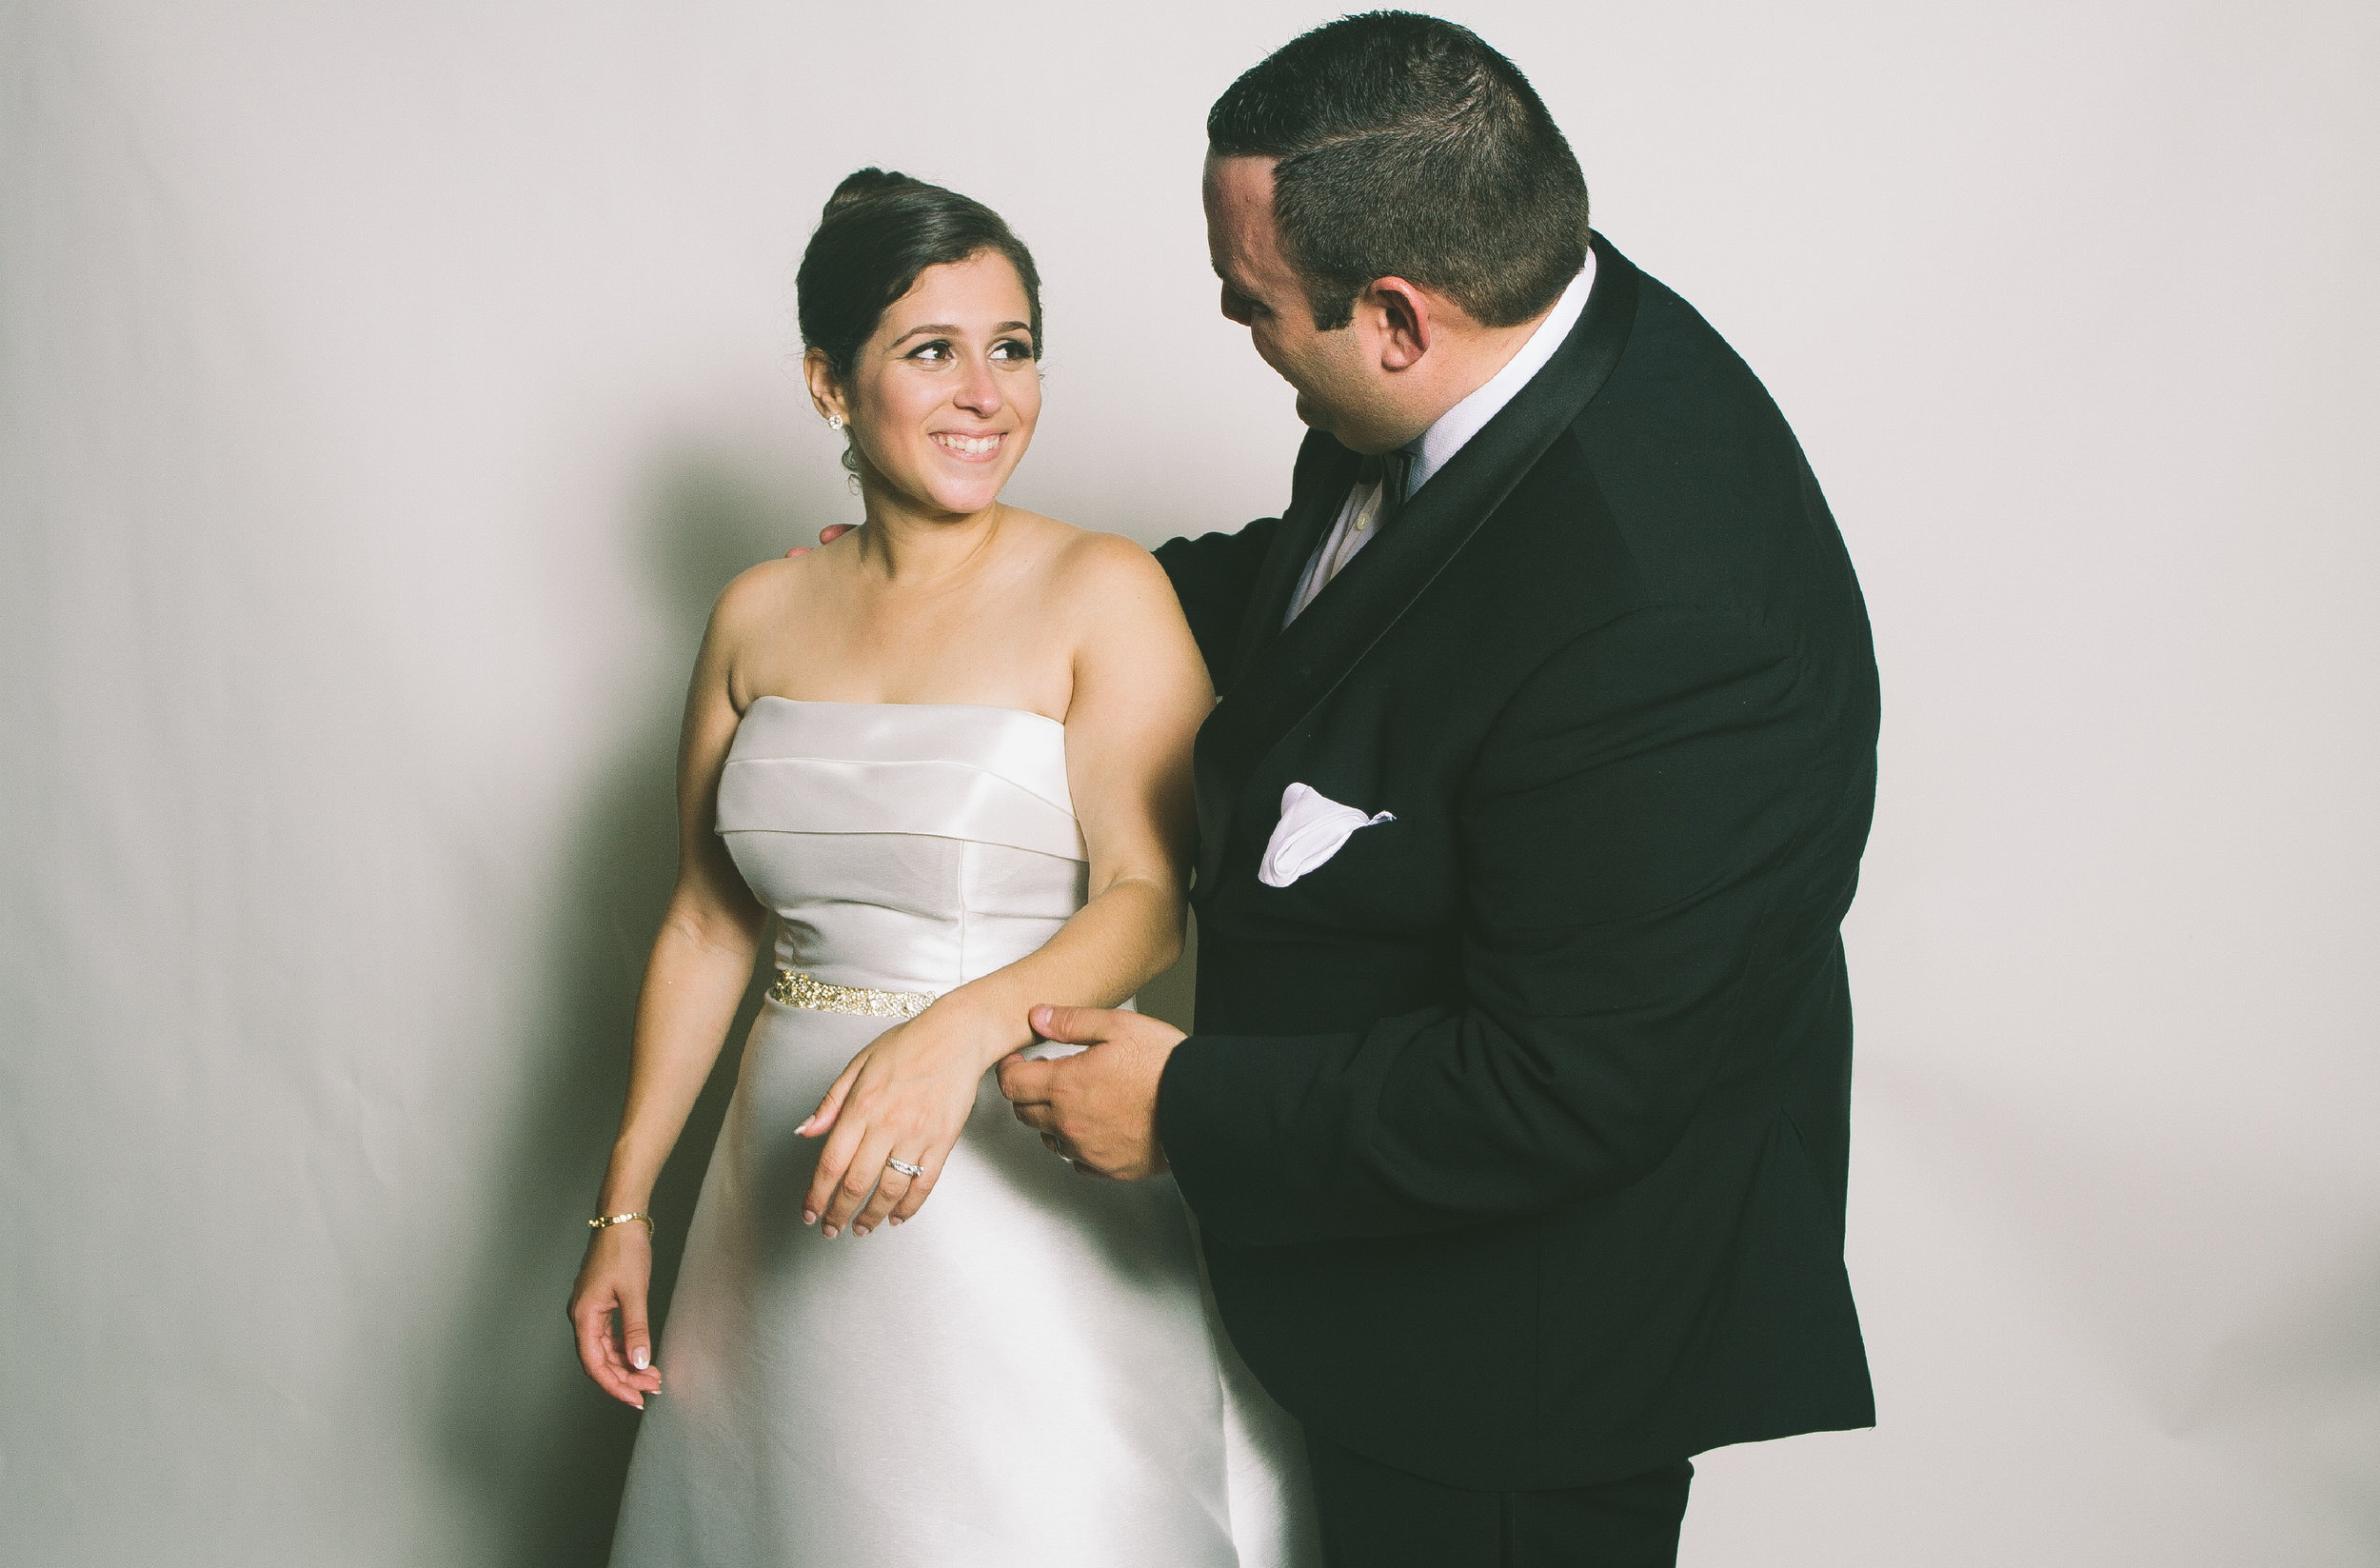 Marelys + Oscar Wedding Wackybooth Photobooth38.jpg